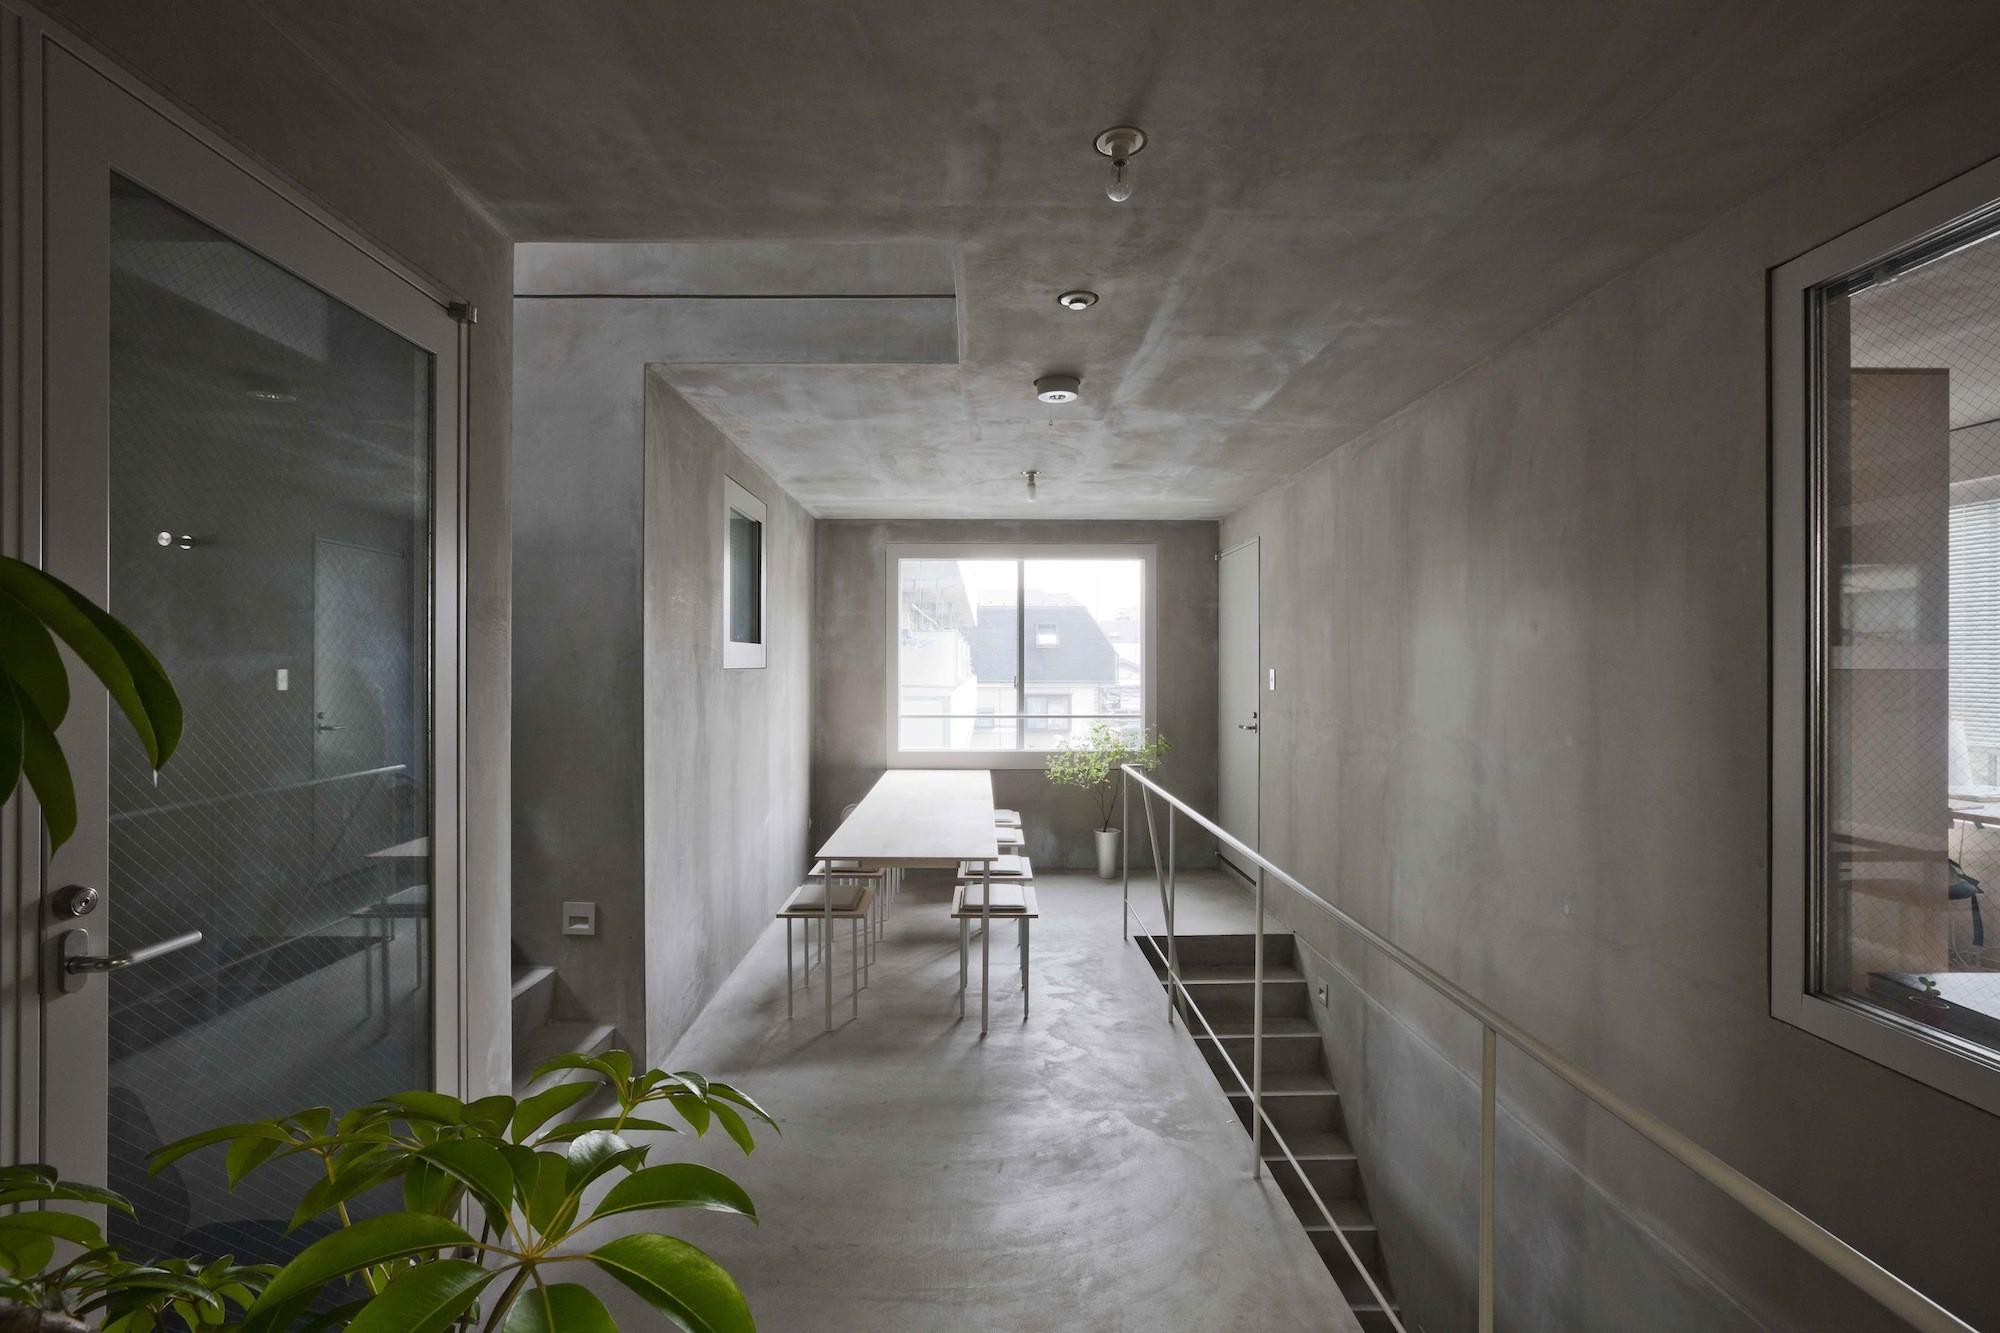 LUZ shirokane / Naoya Kawabe Architect & Associates, © Akinobu Kawabe